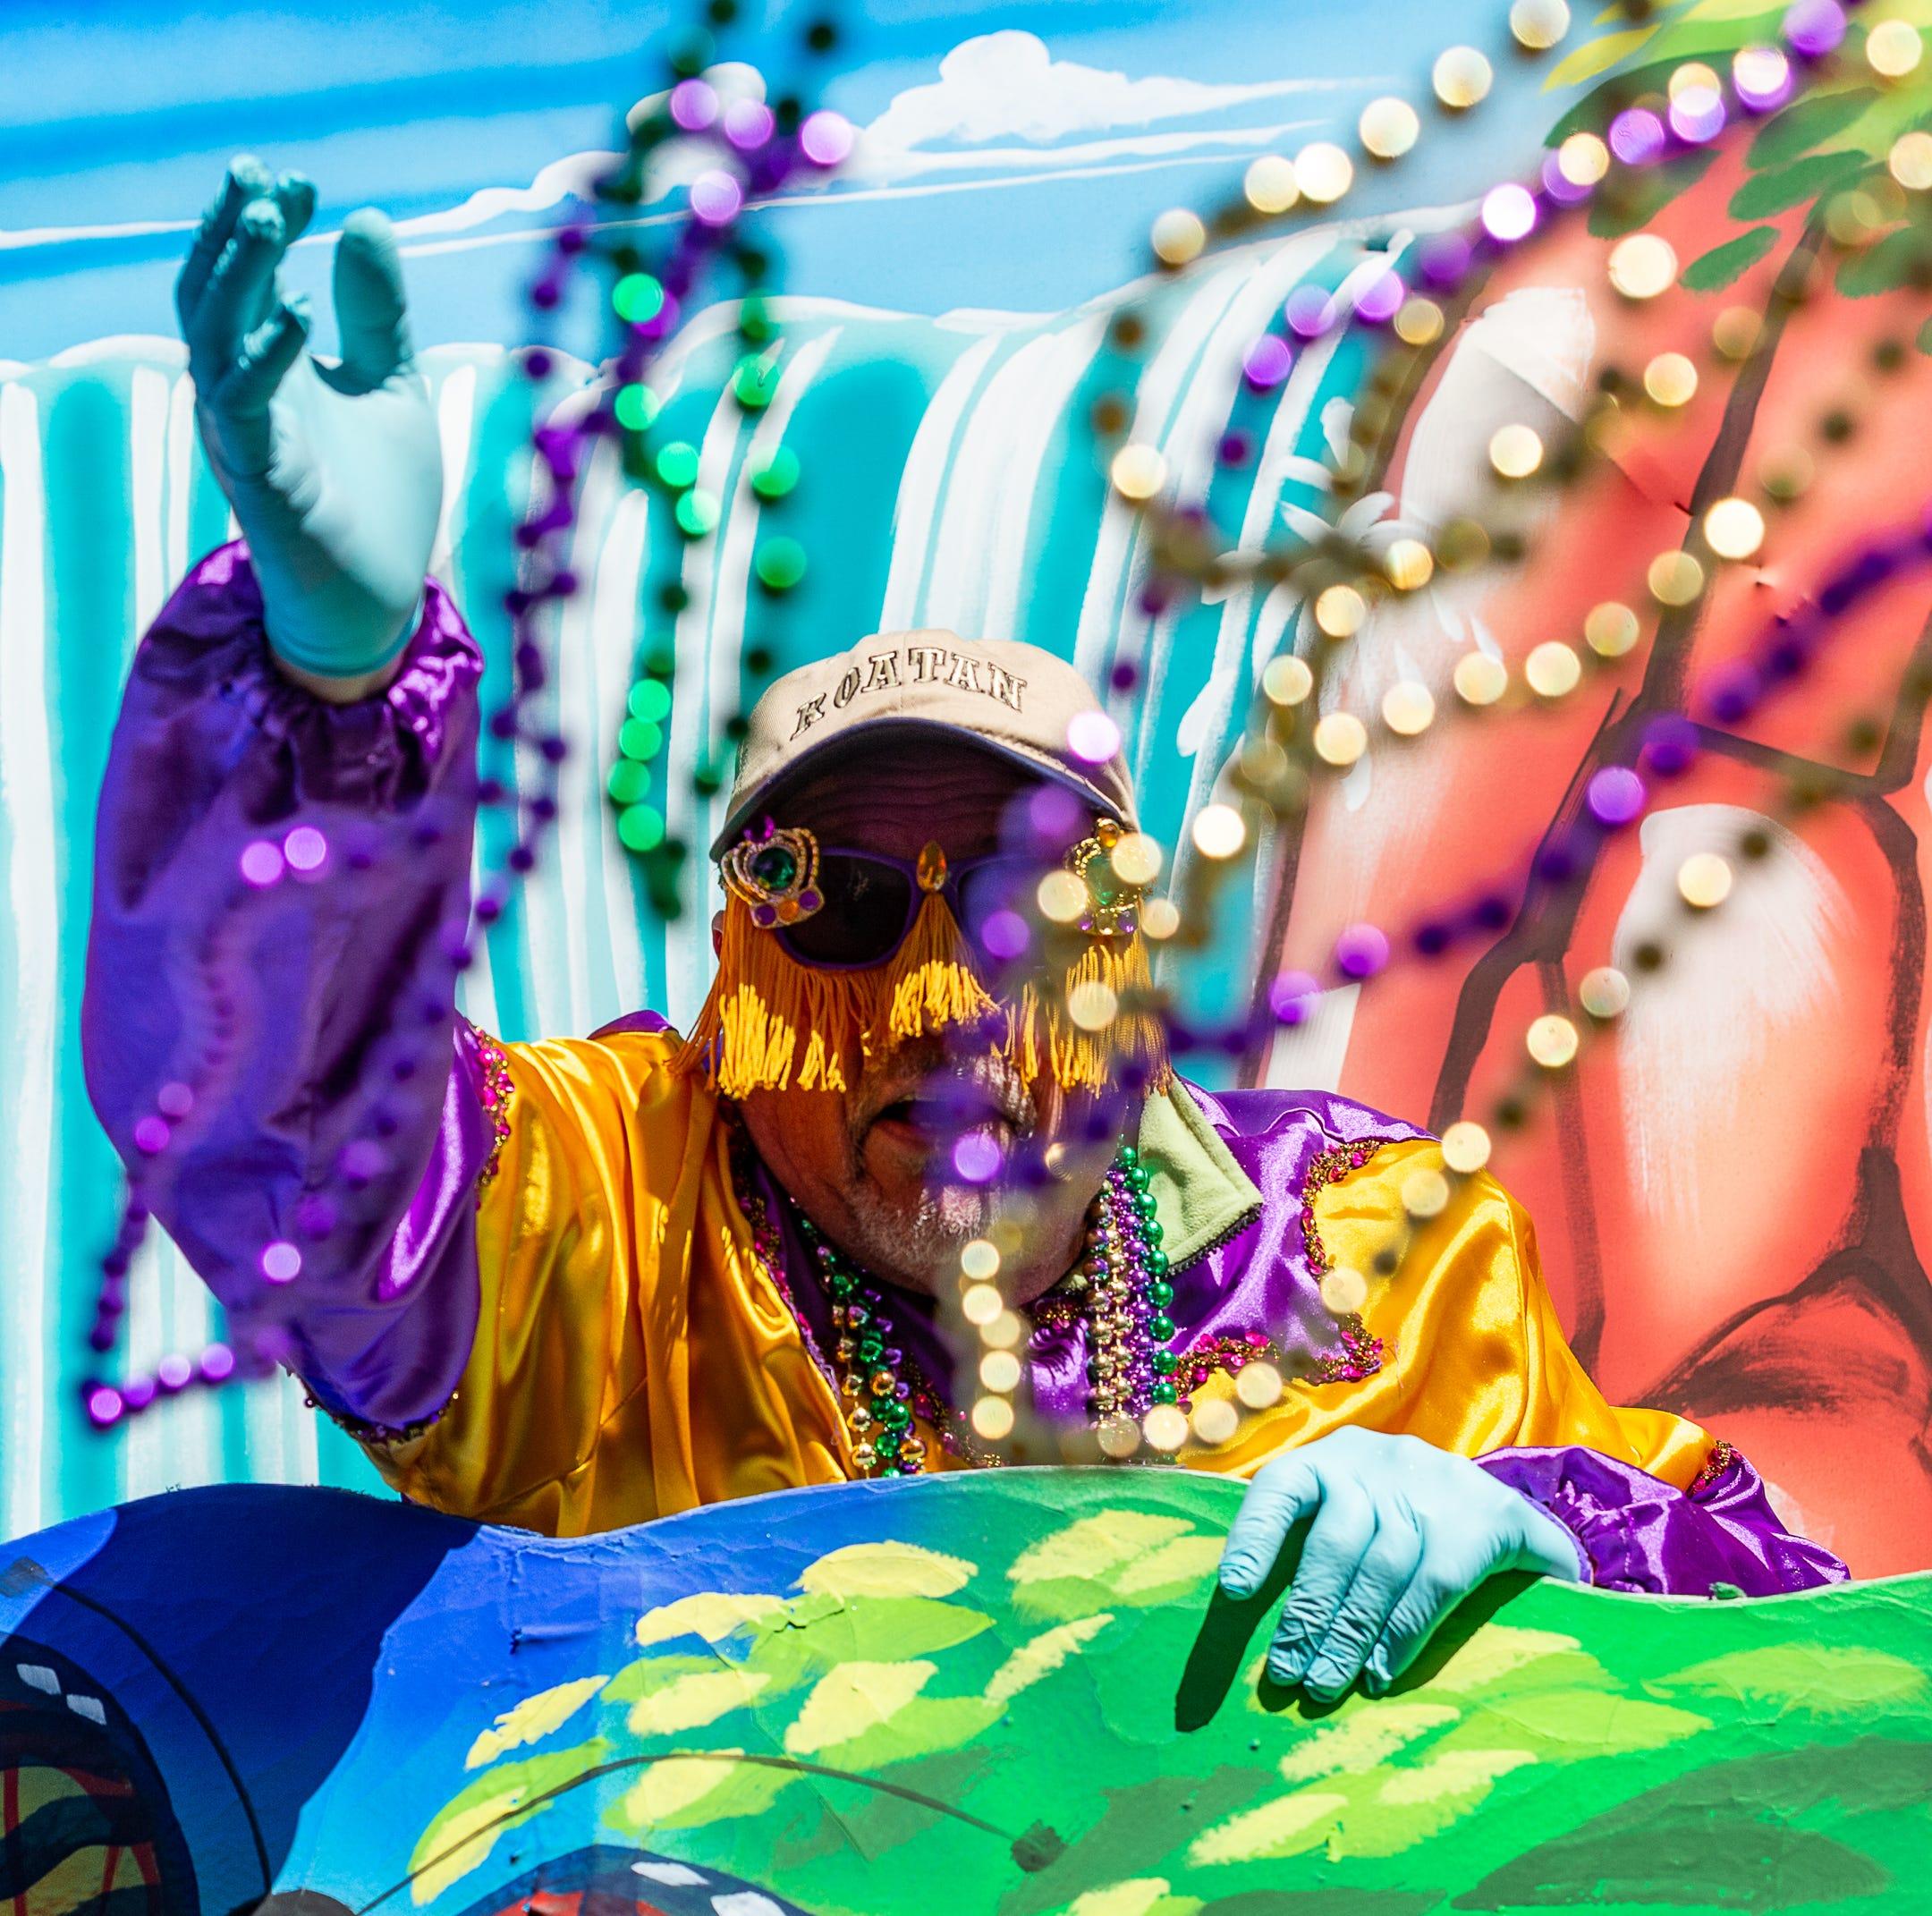 Lafayette's 2019 Mardi Gras celebration in photos